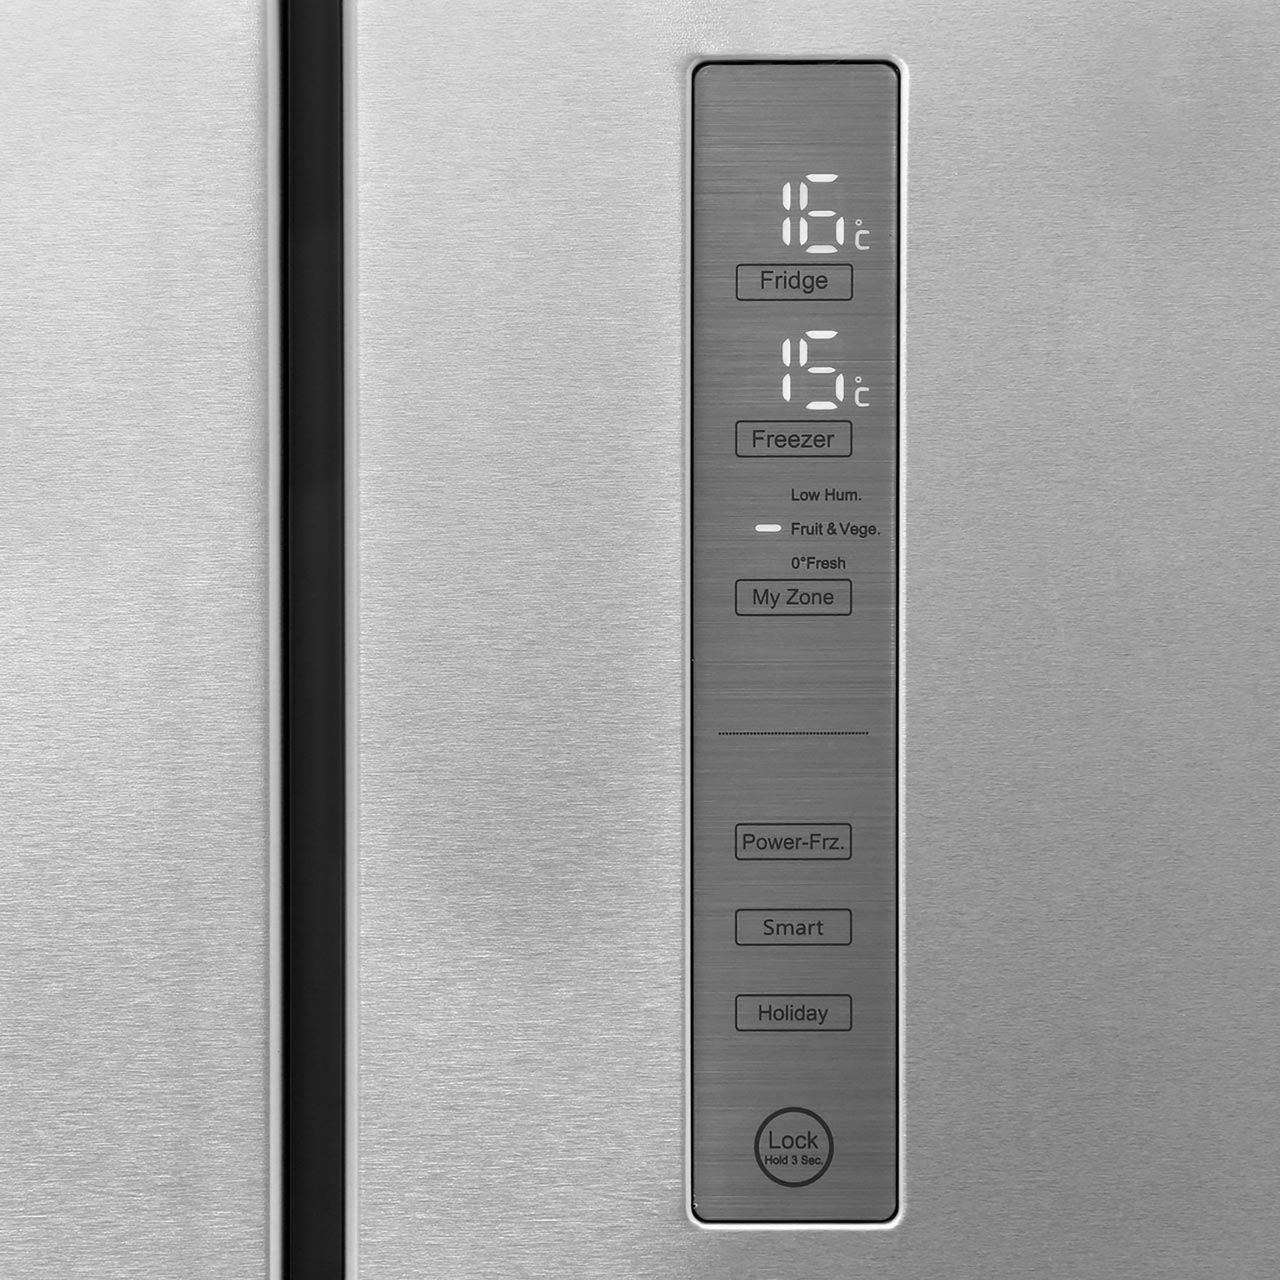 Haier HTF-452DM7 American Fridge Freezer - Stainless Steel - A++ Rated